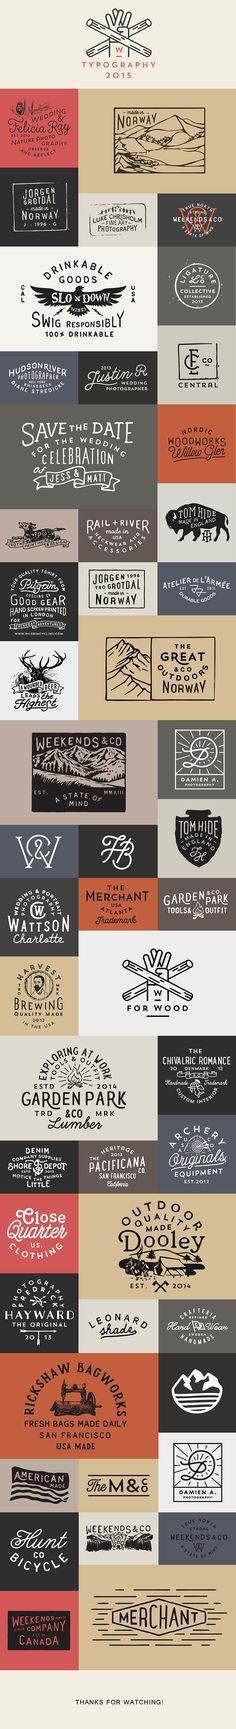 Logos & Typography 2015 on Behance